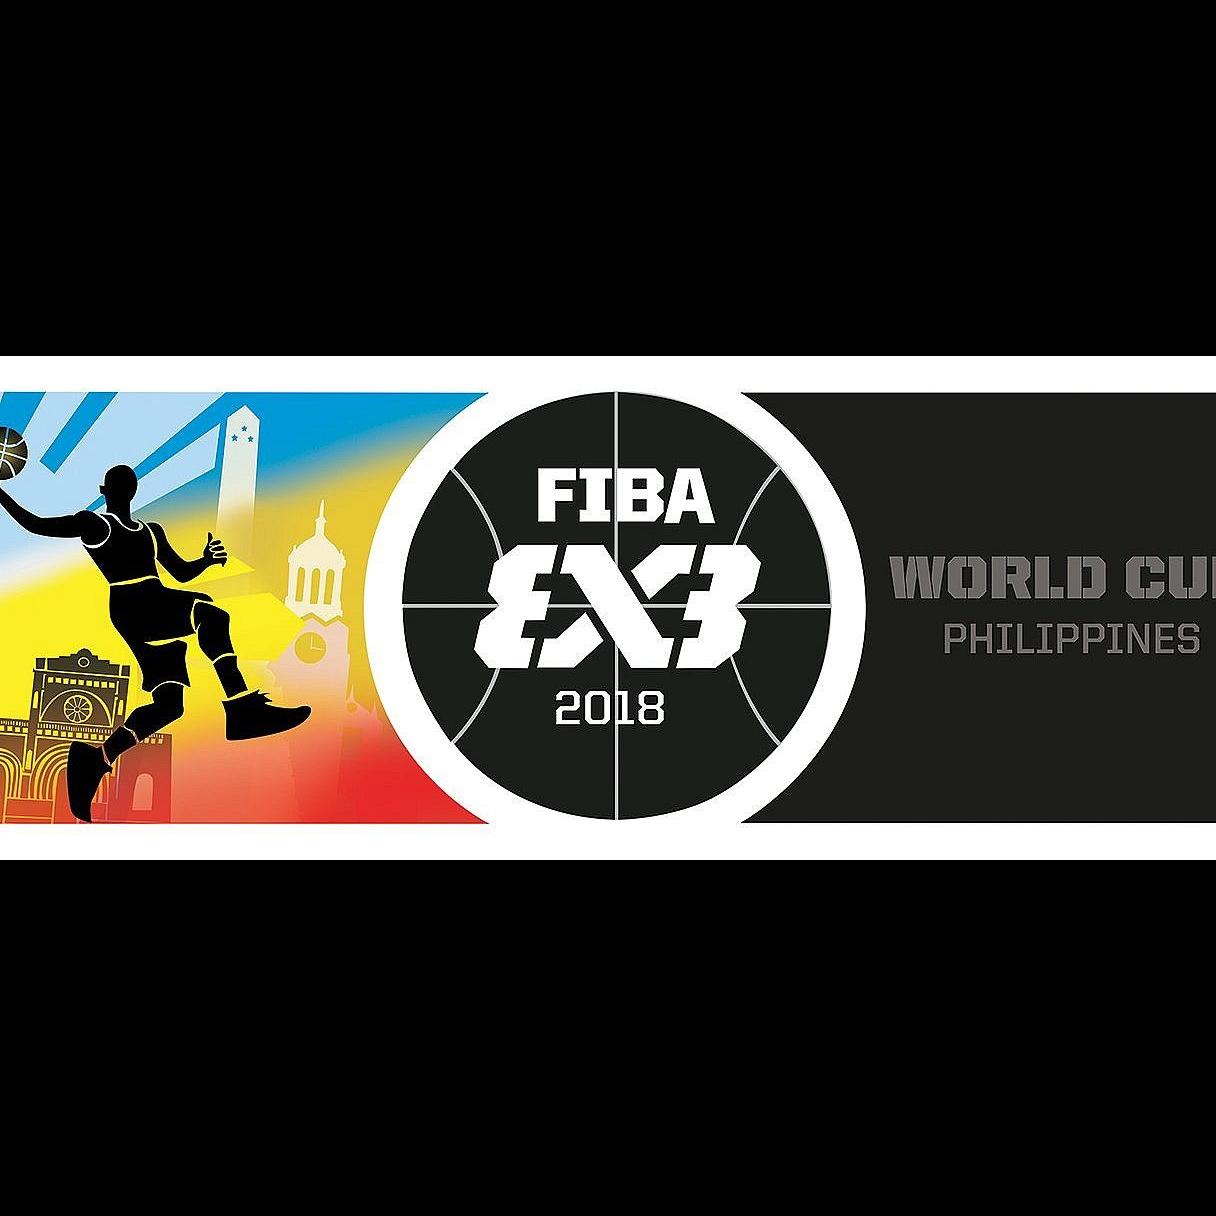 2018 FIBA 3x3 World Cup